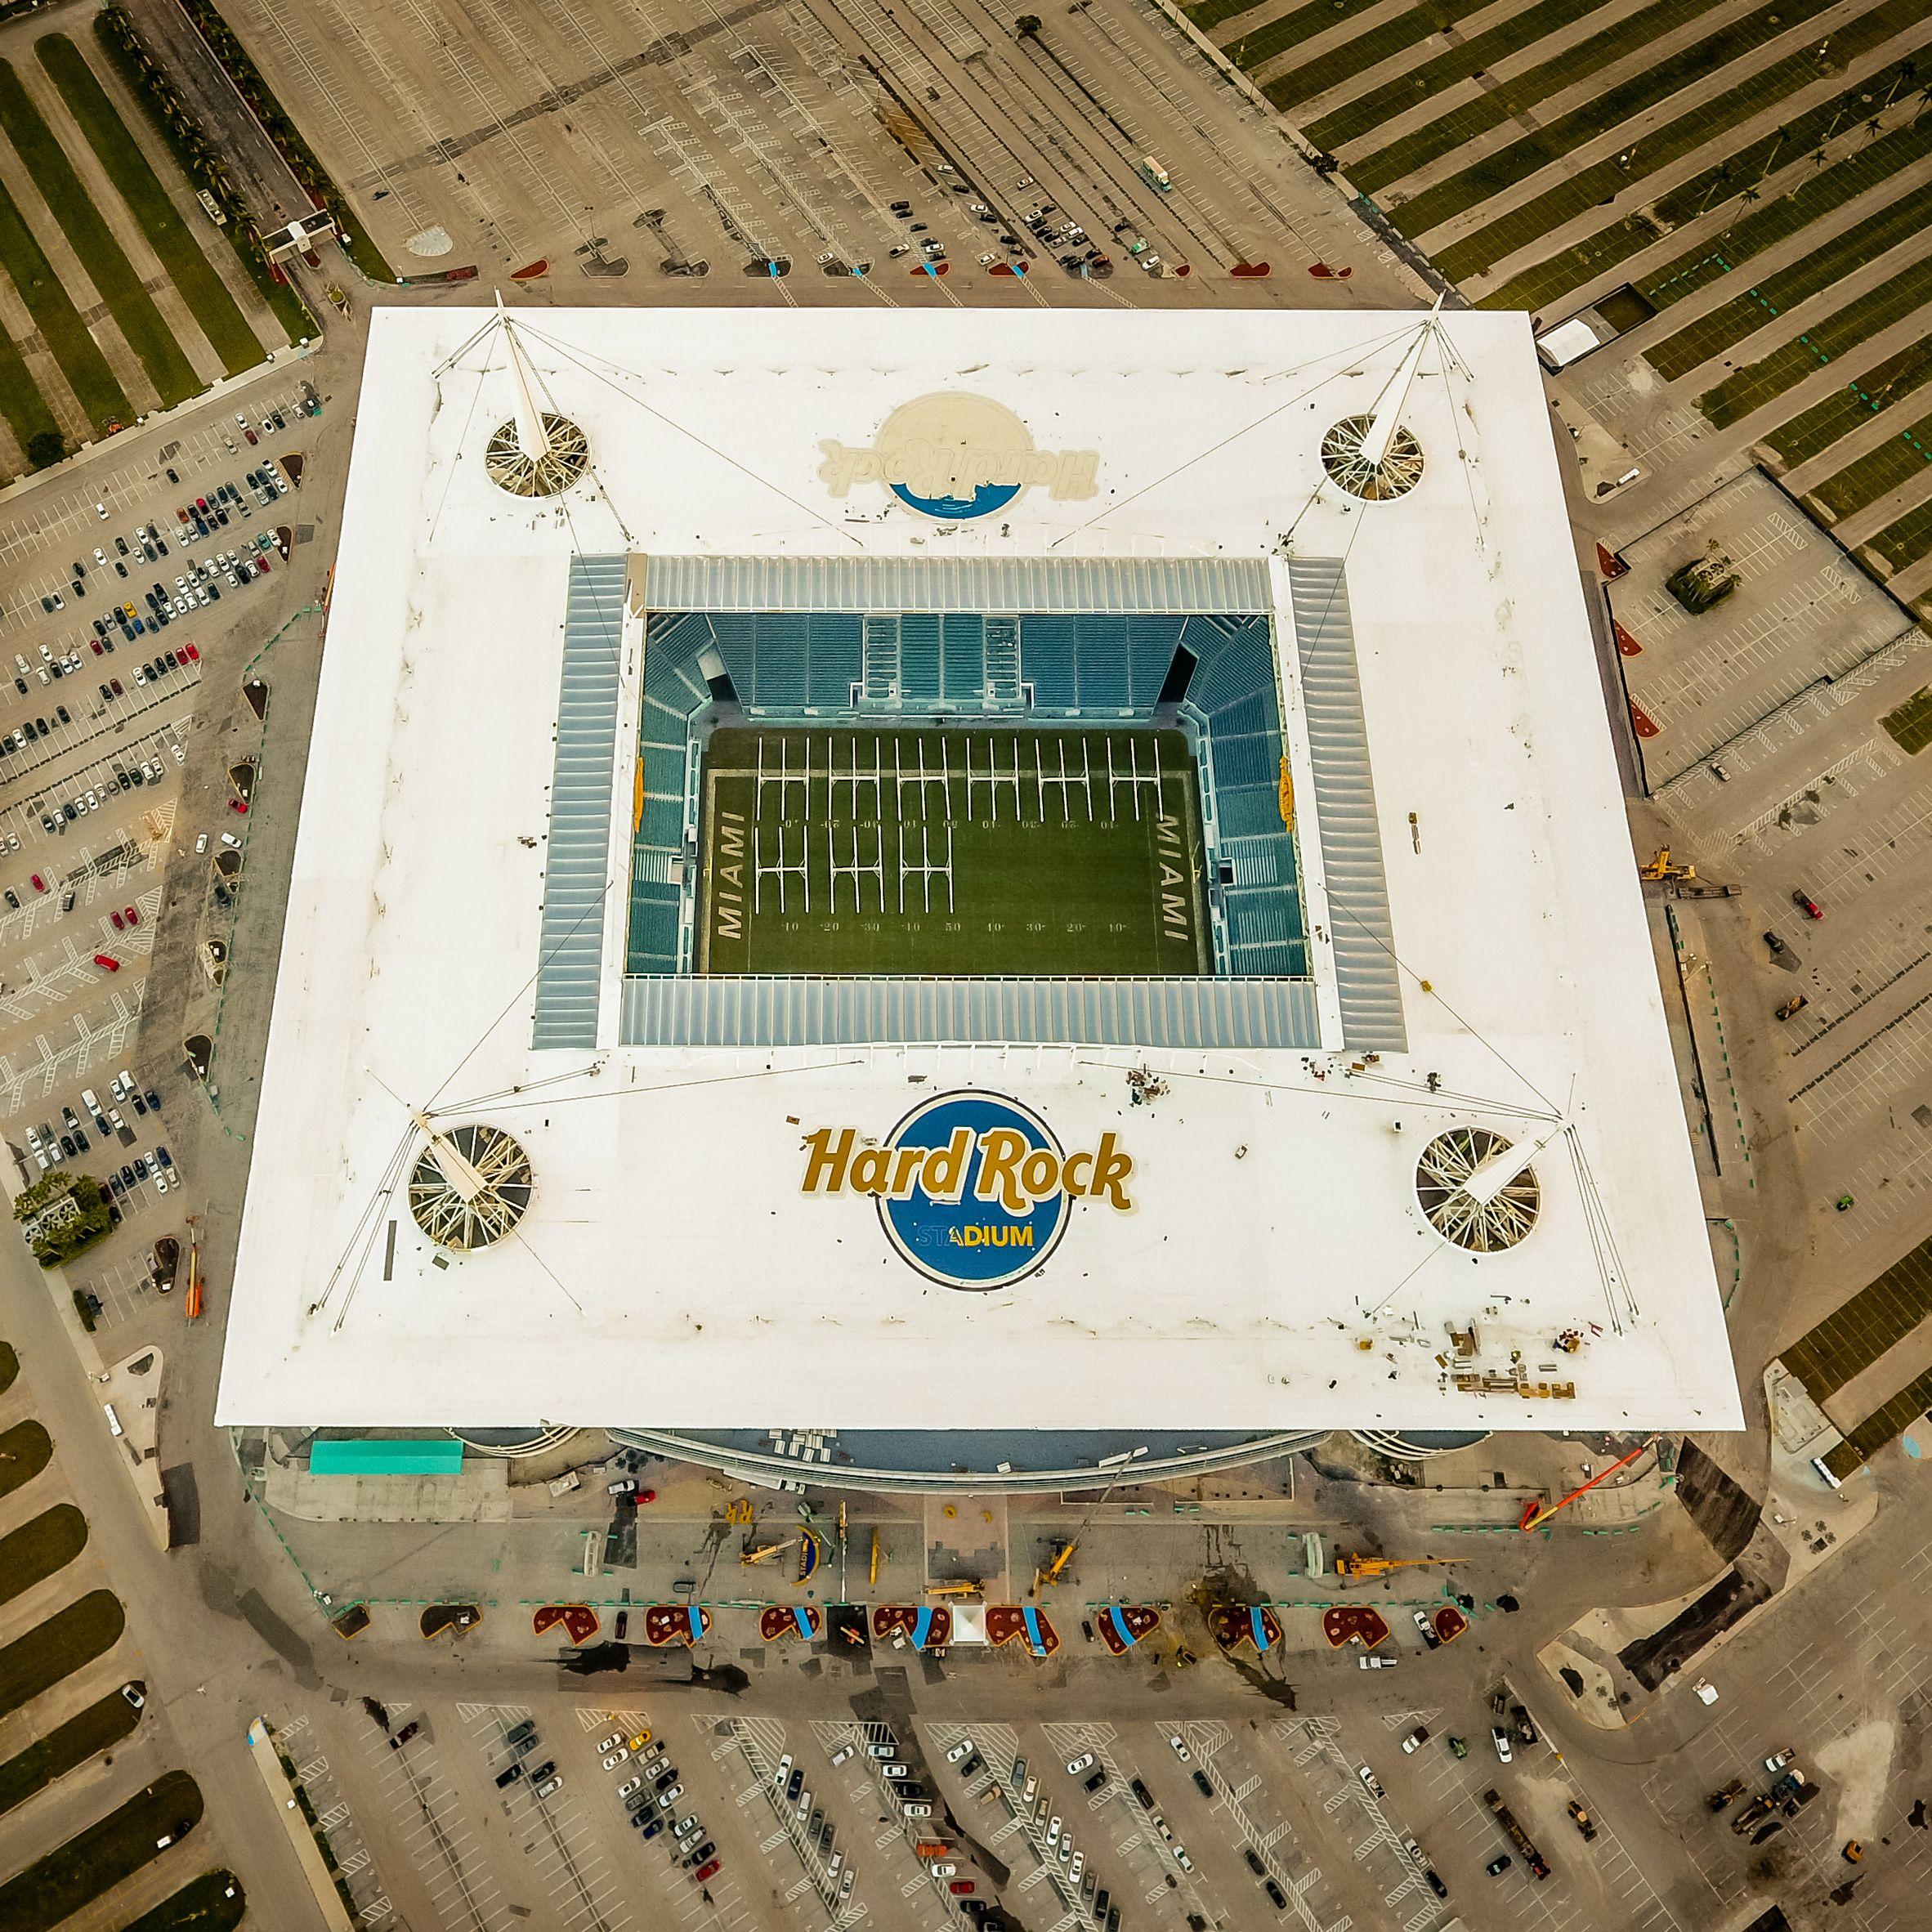 af673828c211a4b63ff2e2ebb24f5d8b - Hard Rock Stadium Miami Gardens Location